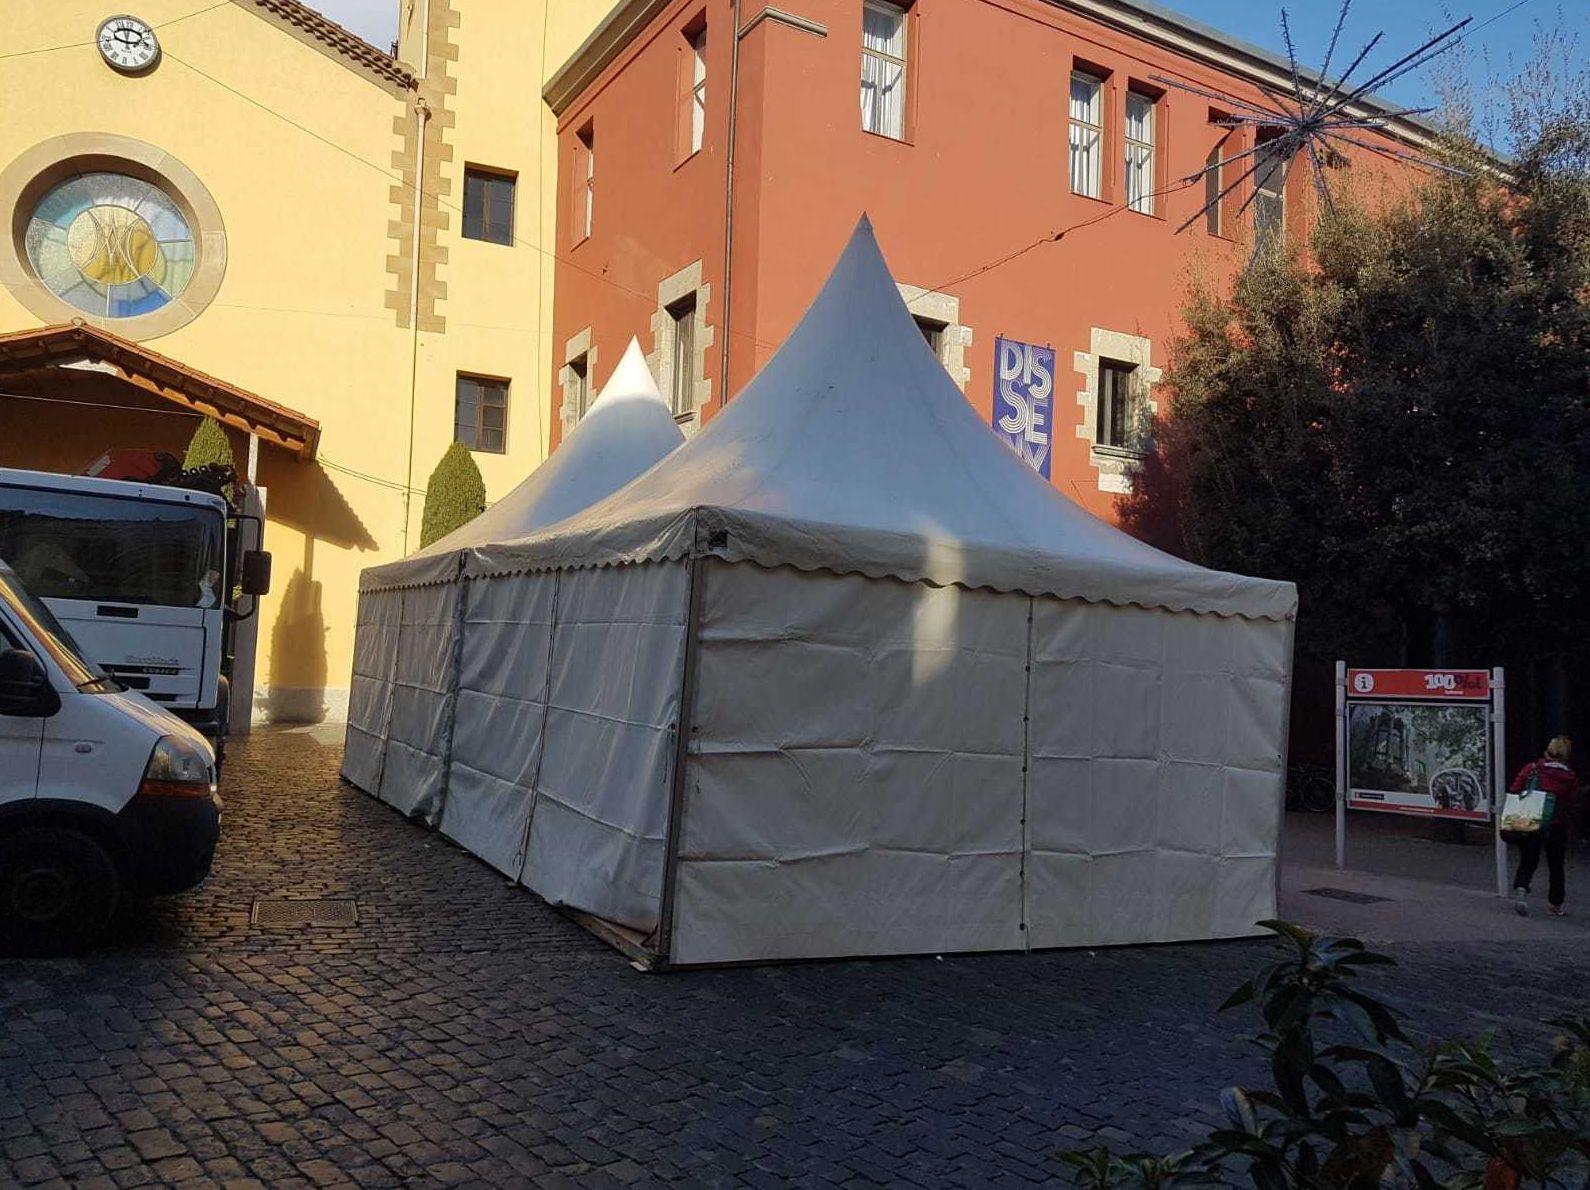 Alquiler y montaje de pagodas en Girona